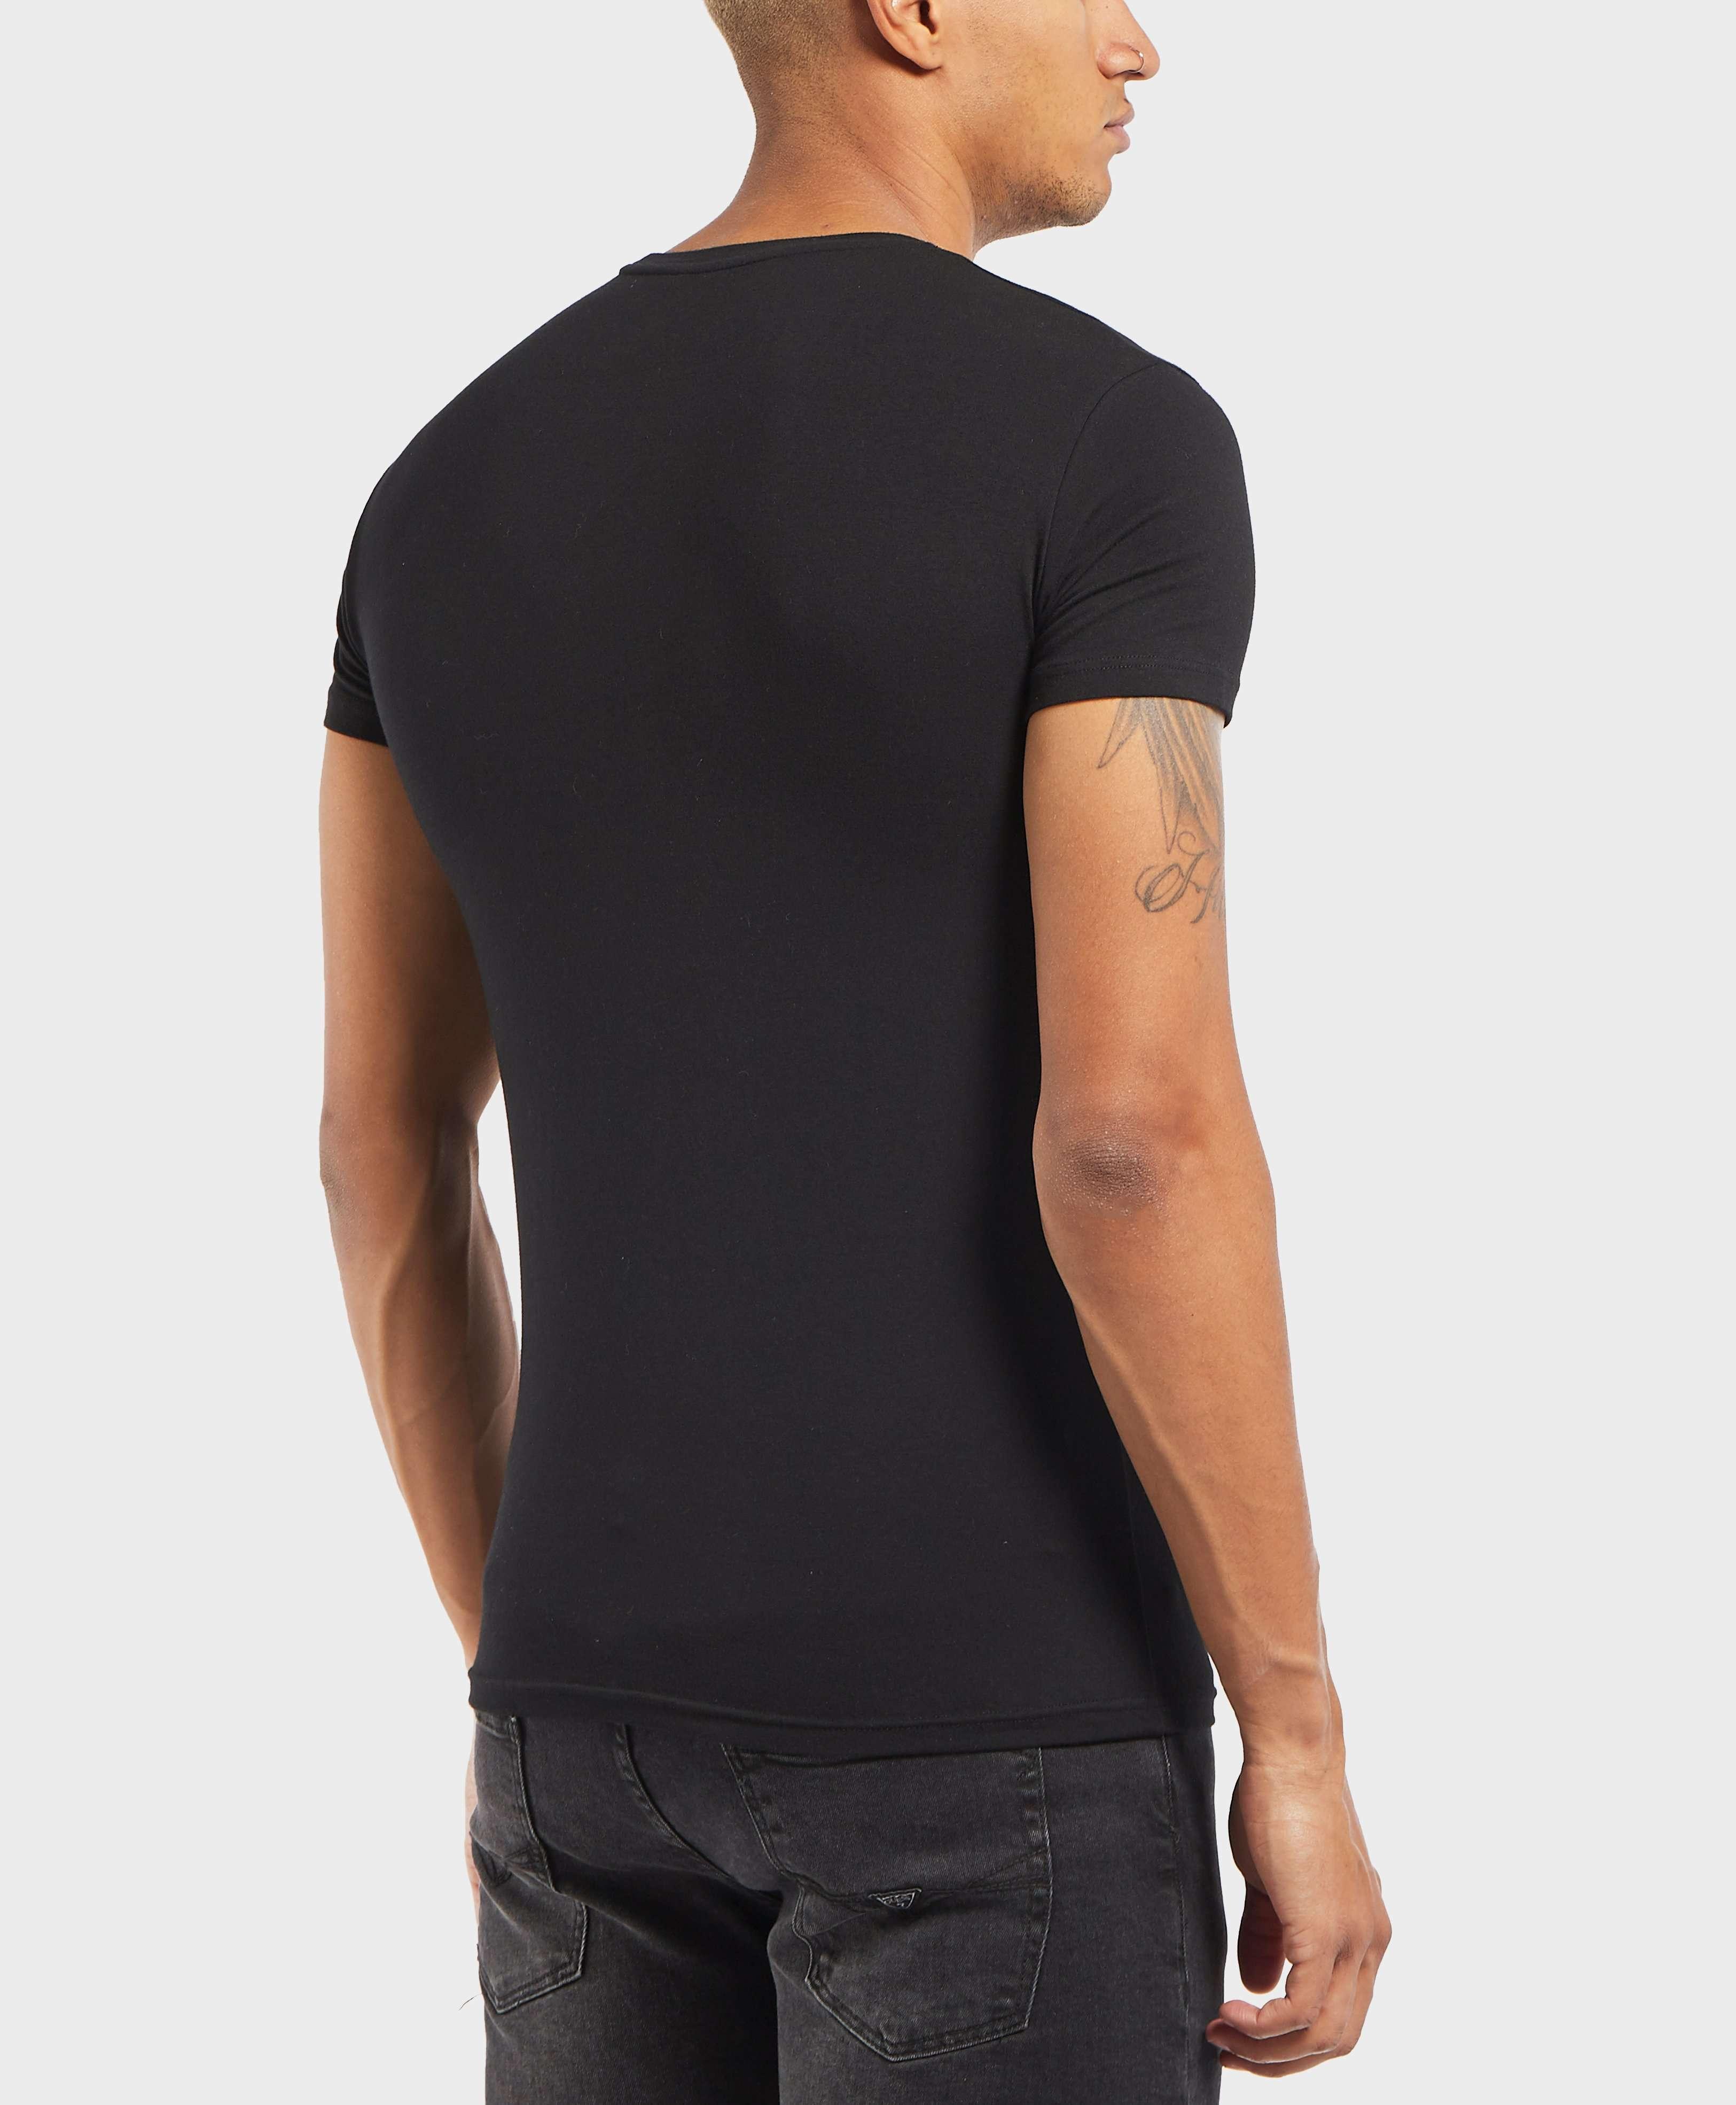 Emporio Armani Eagle Crew Short Sleeve T-Shirt